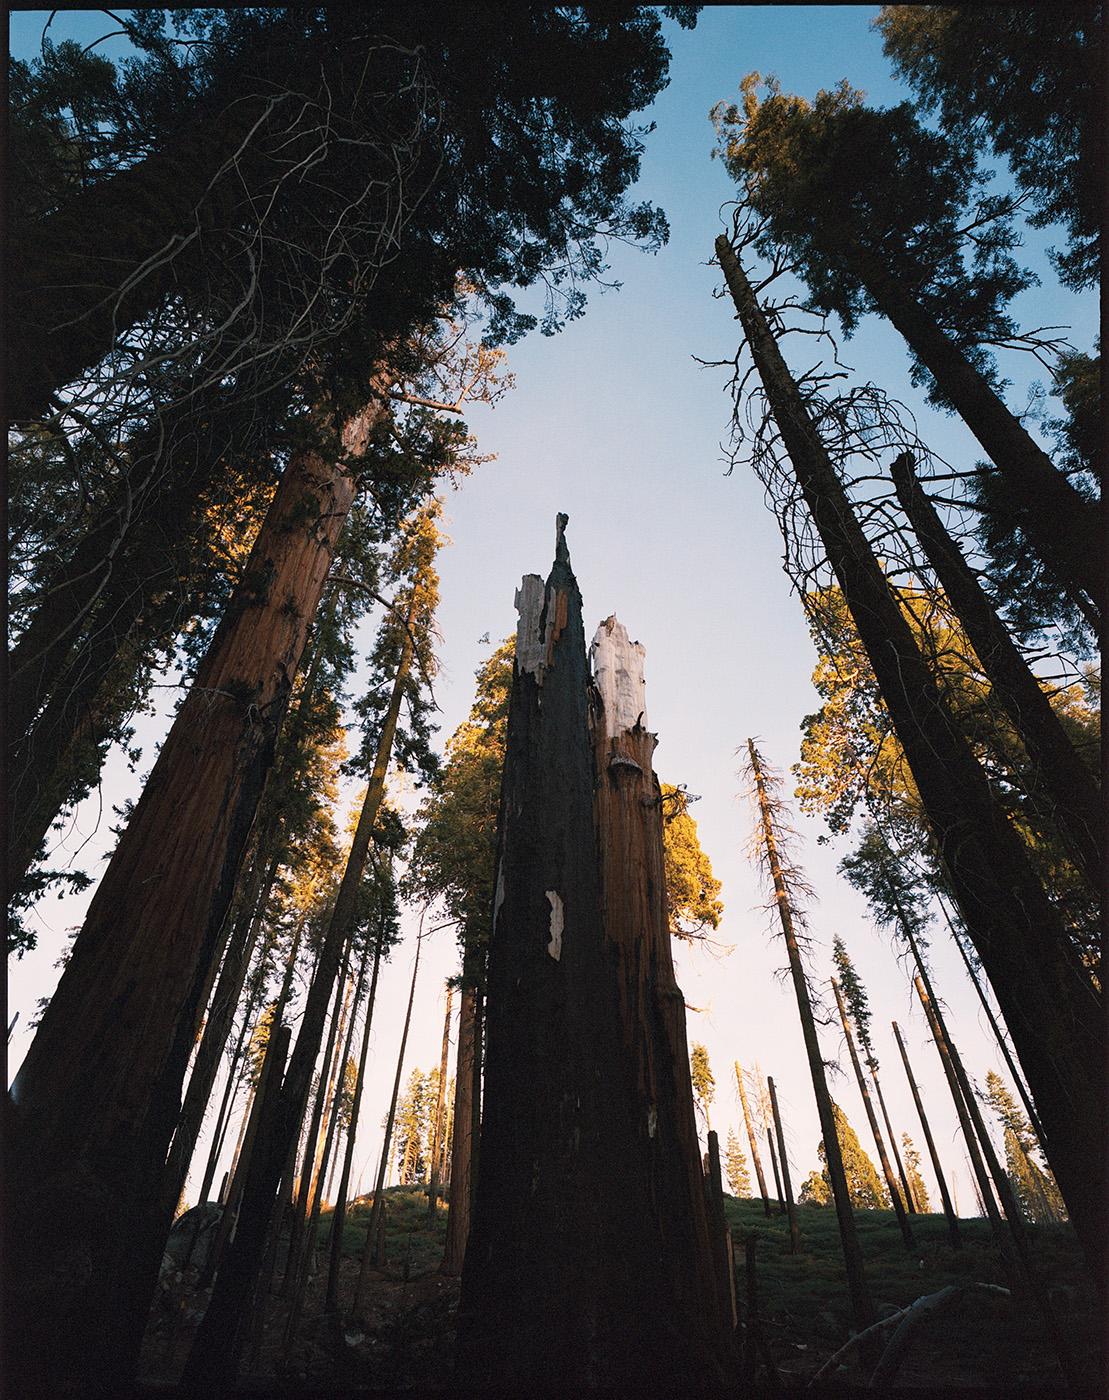 Deborah_Farnault_Sequoia_2018_07.jpg